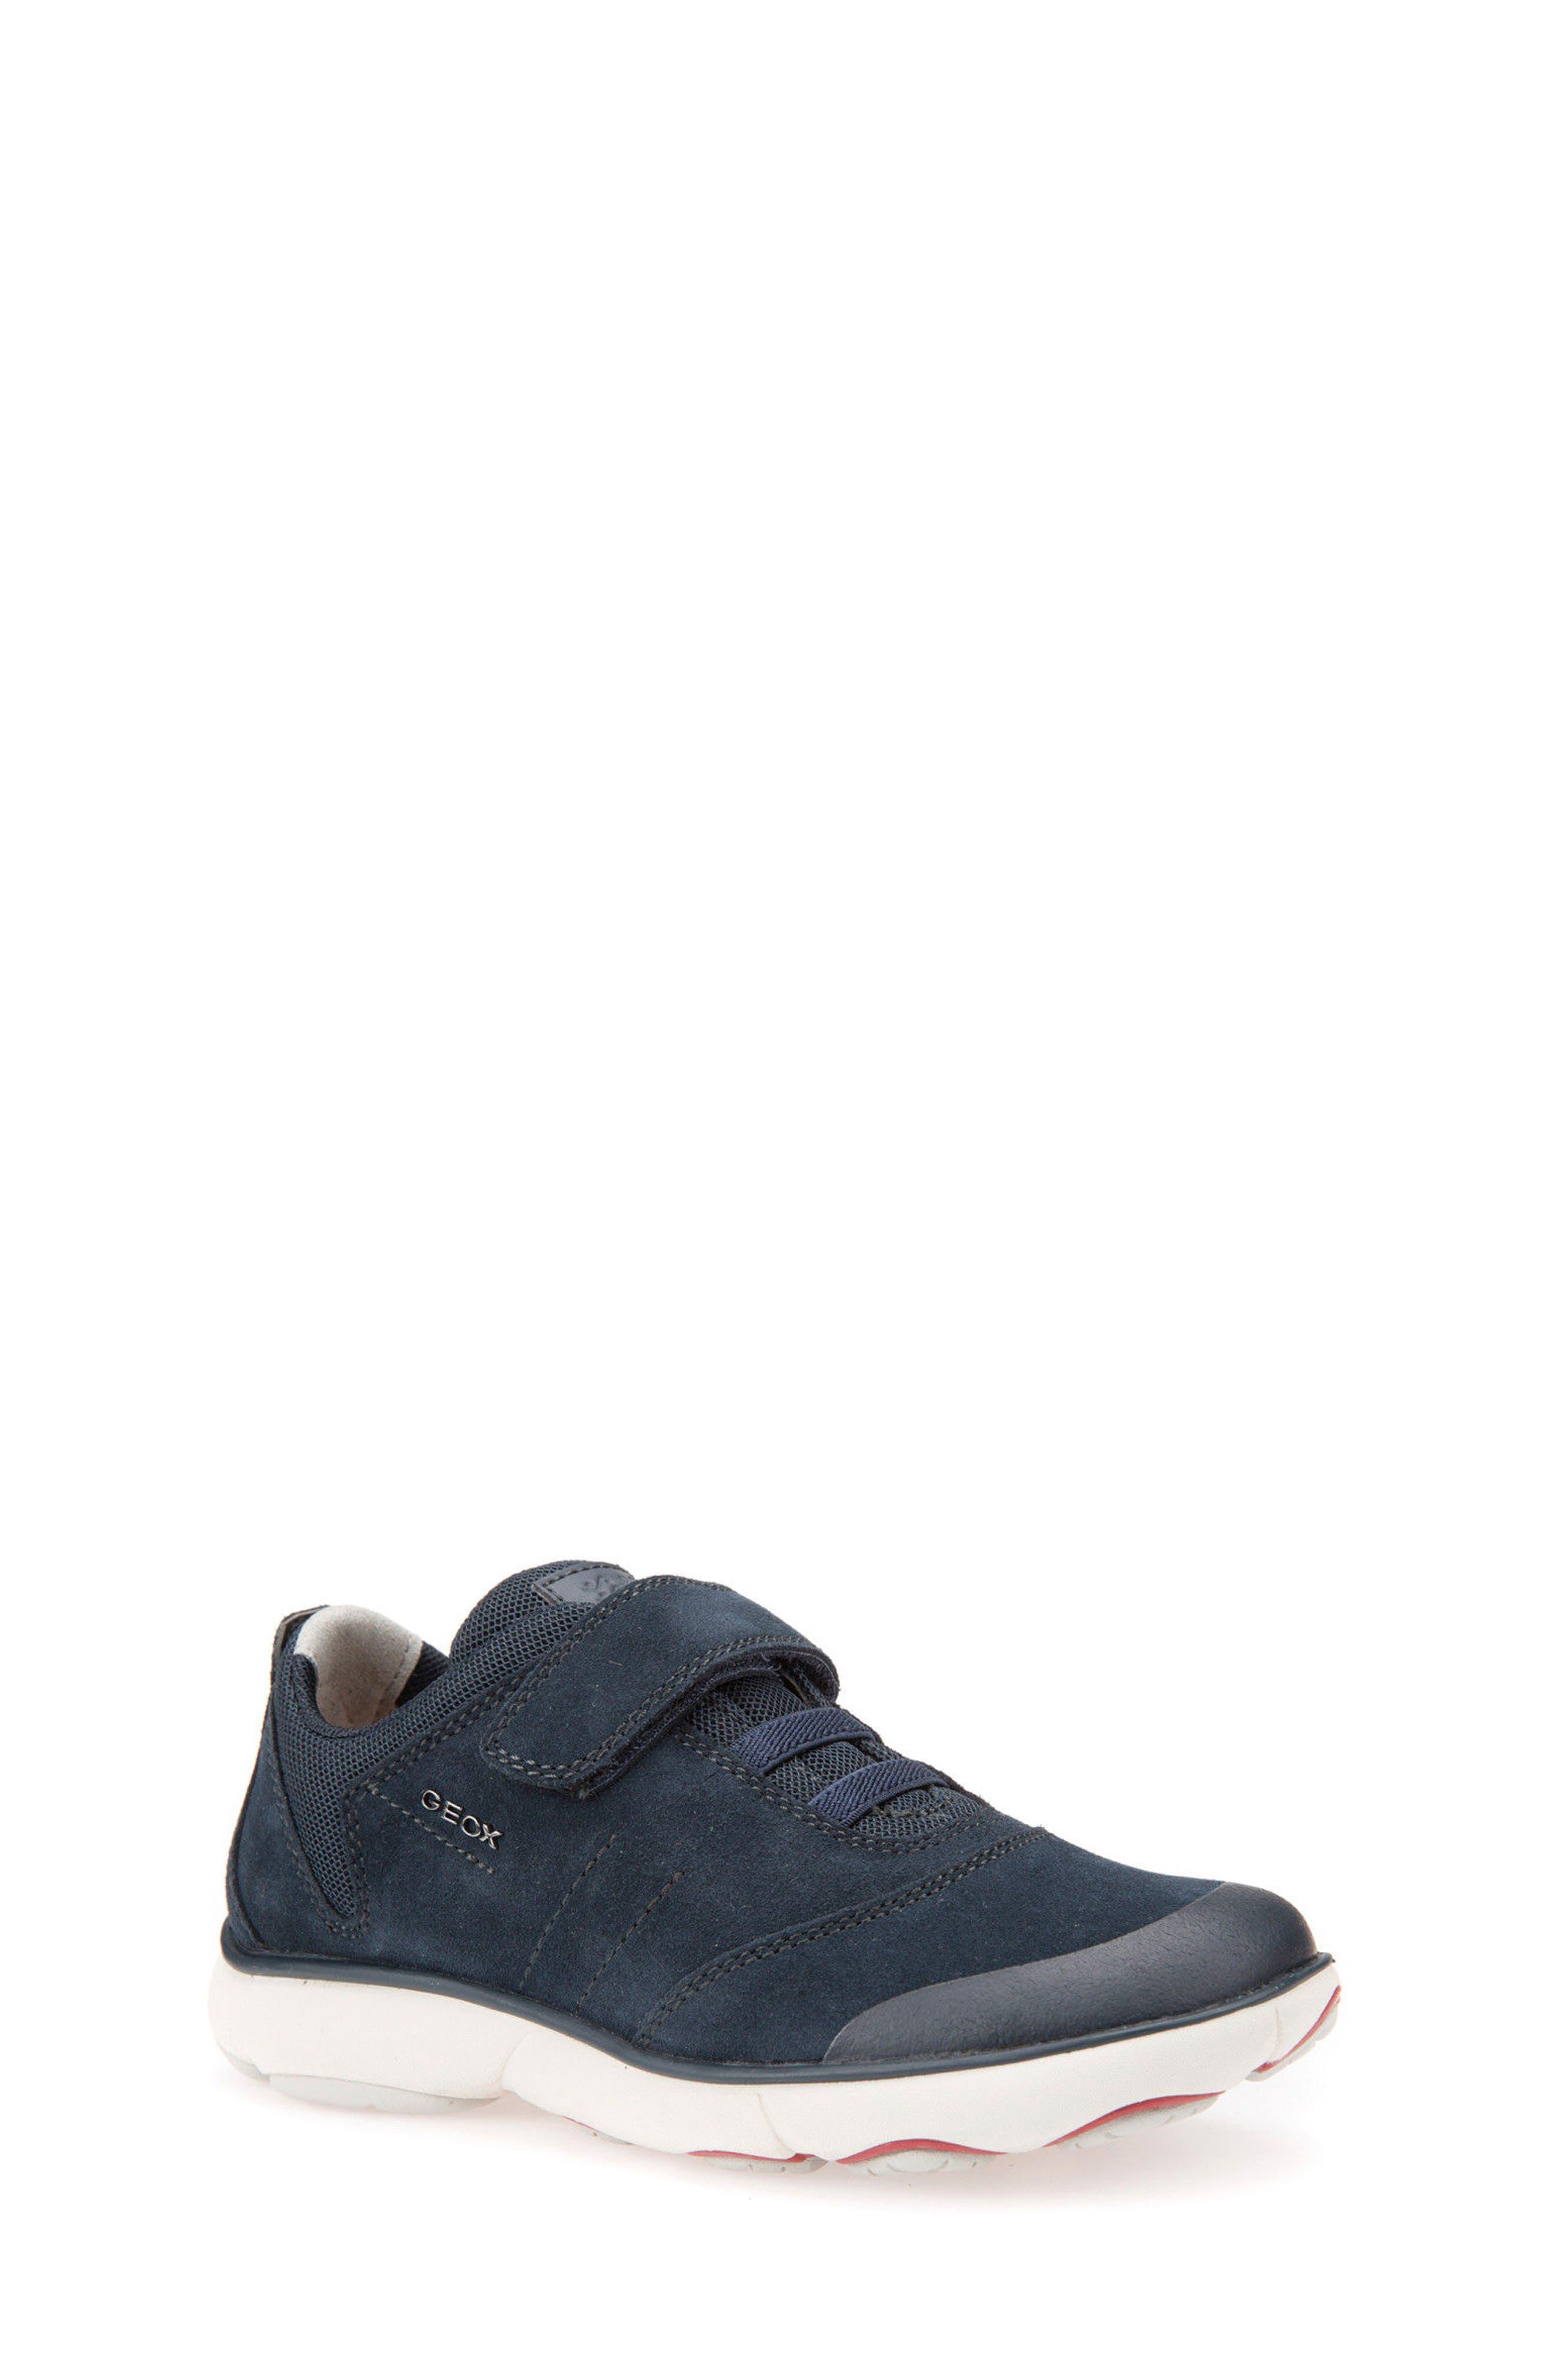 Main Image - Geox Nebula Low Top Sneaker (Toddler, Little Kid & Big Kid)